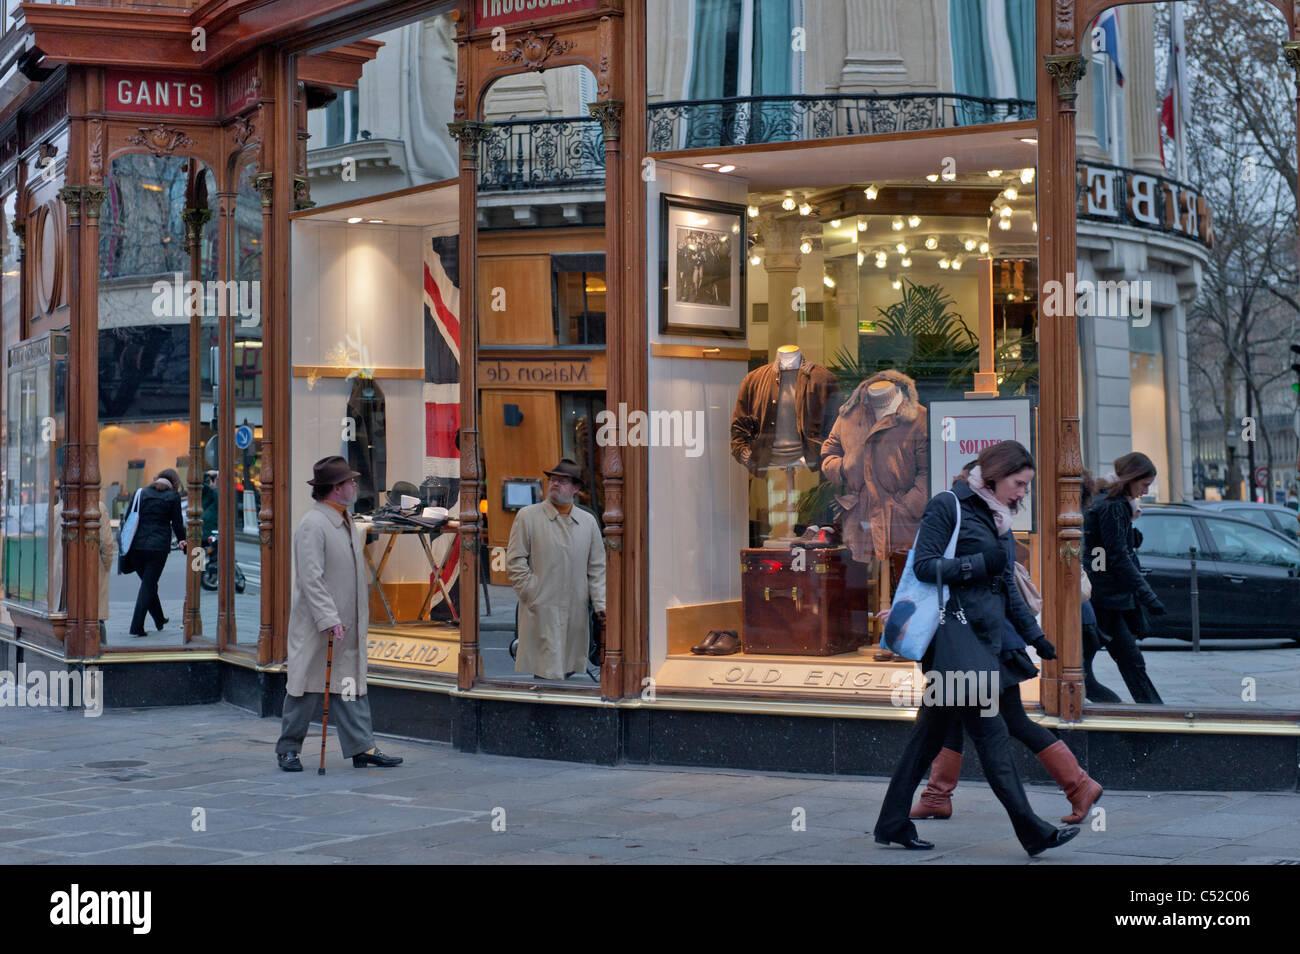 Old England Paris France - Stock Image